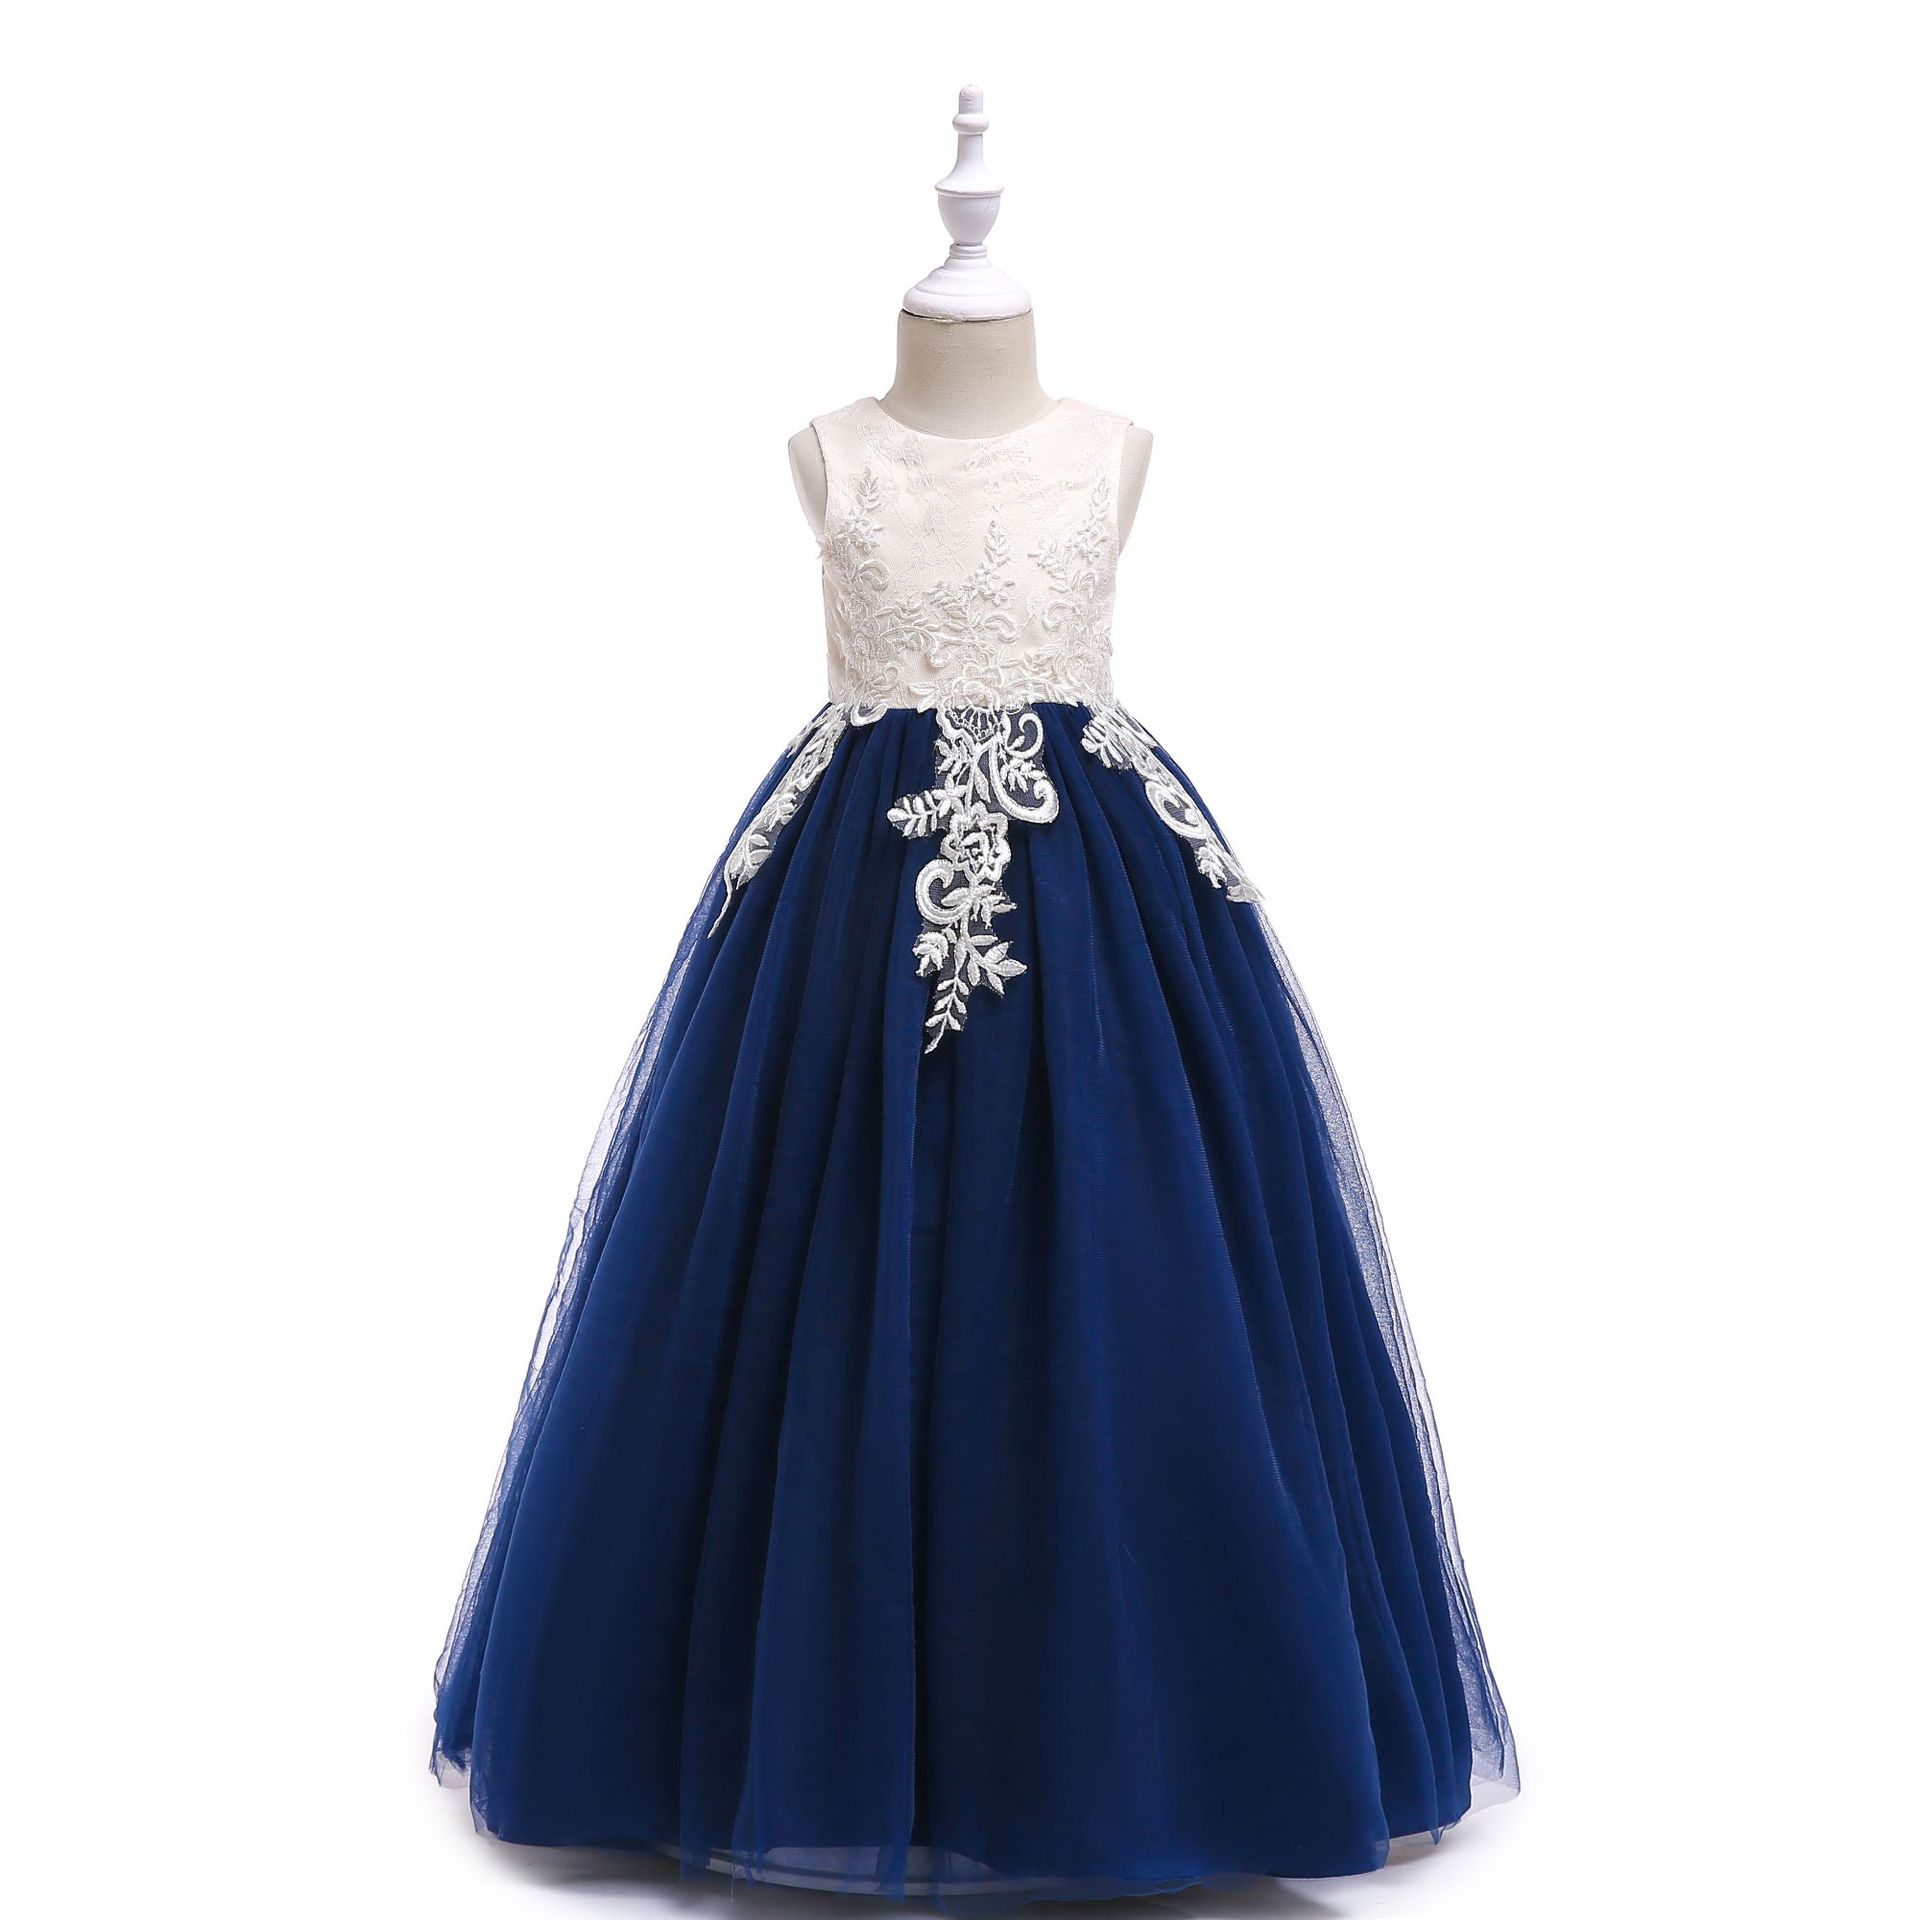 Long Flower Girls Wedding Dress Elegant Beach Navy Blue Vestido De Festa Longo 4 6 8 10 12 14 Years Old Girls Clothes 184062